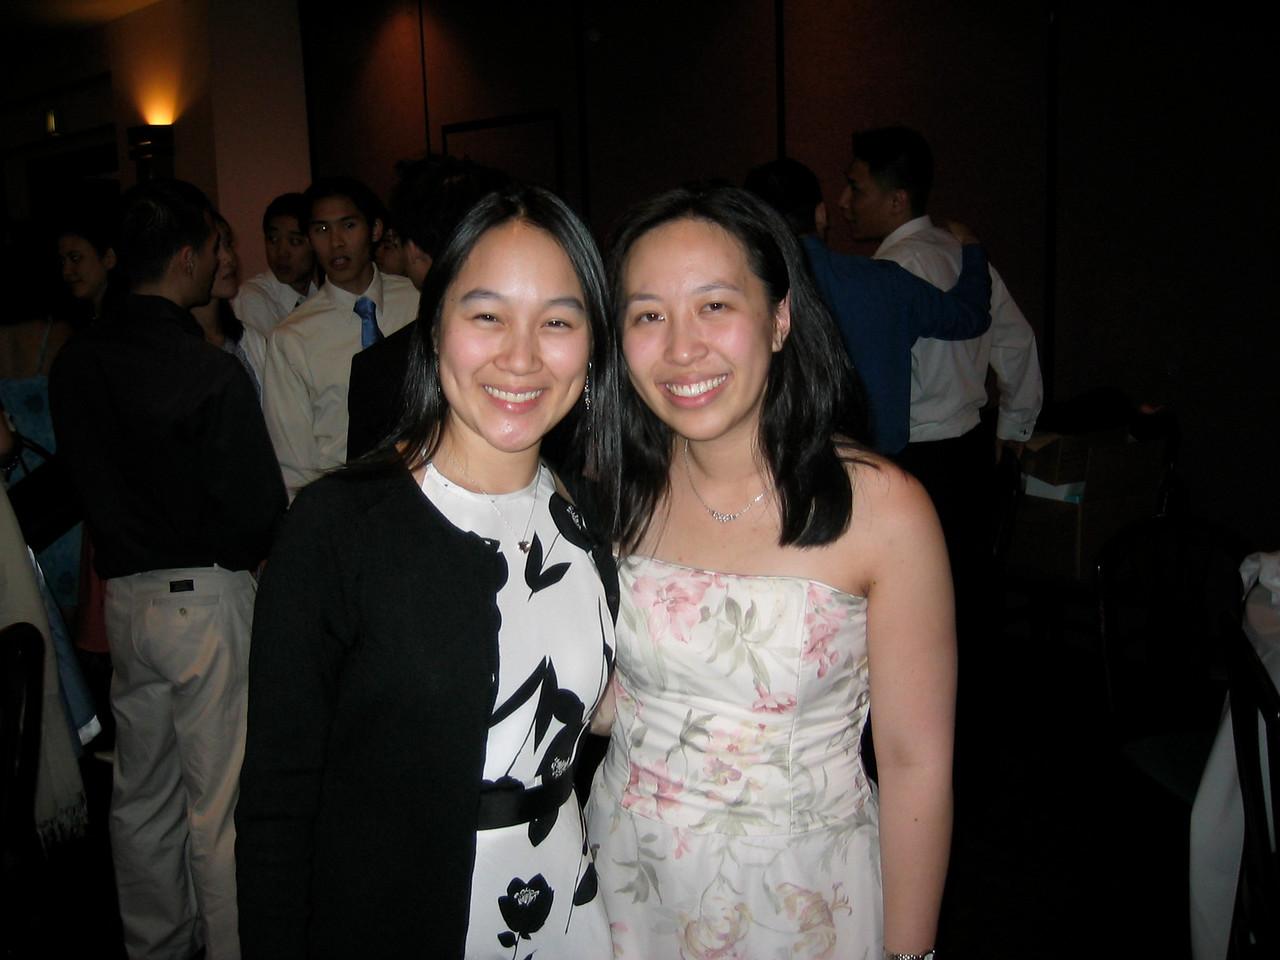 Reception - Melissa Lin & Wenyin Choi